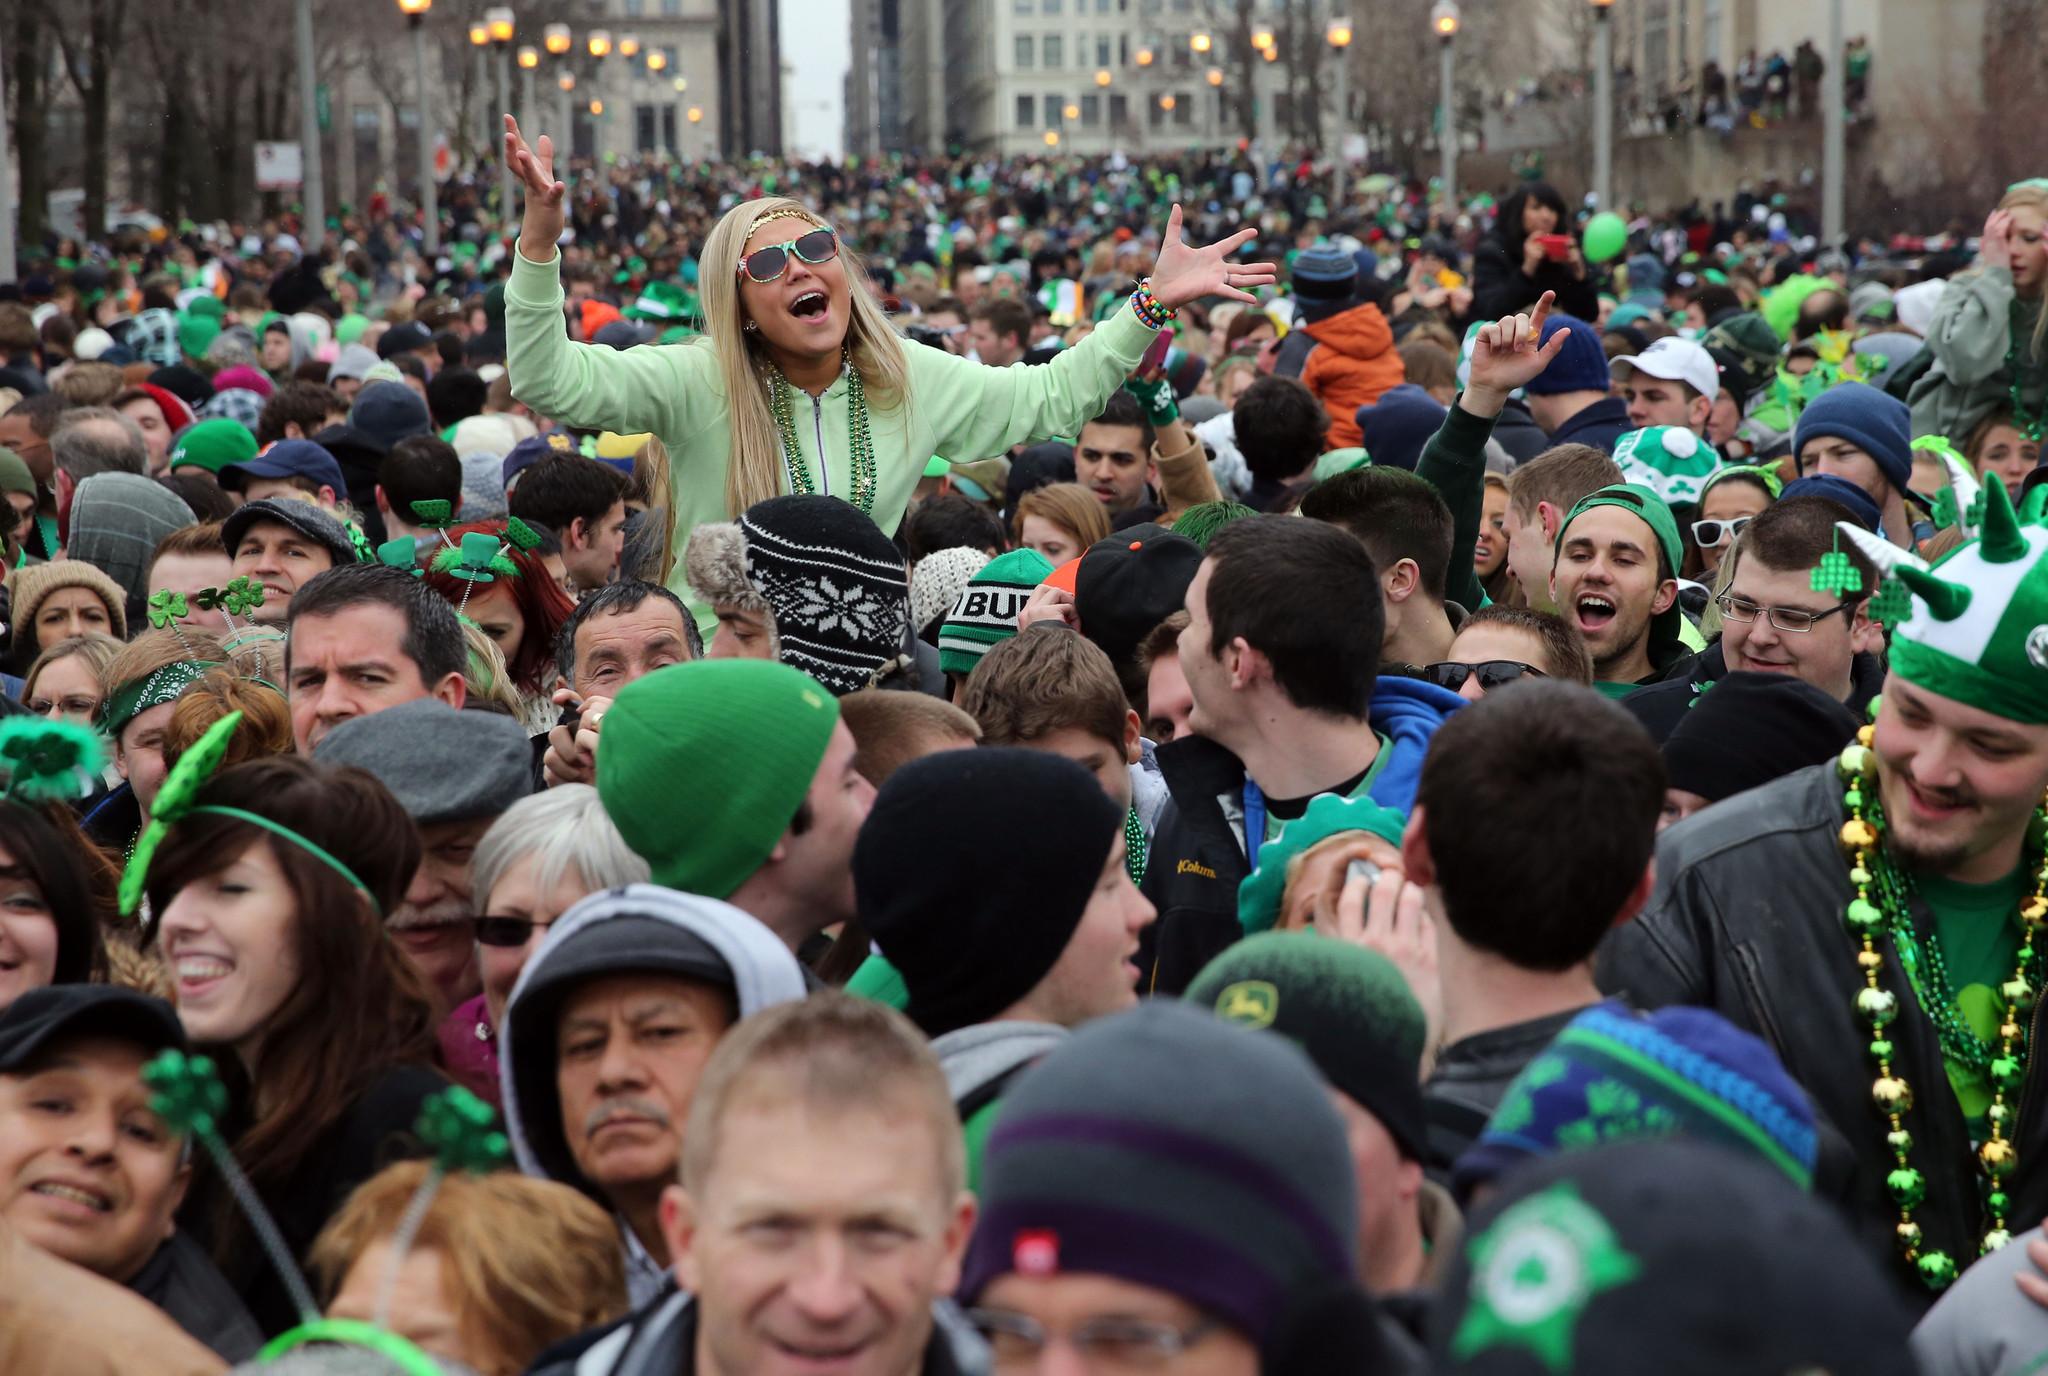 redeye-irish-bars-near-chicago-st-patricks-day-parade-20150312